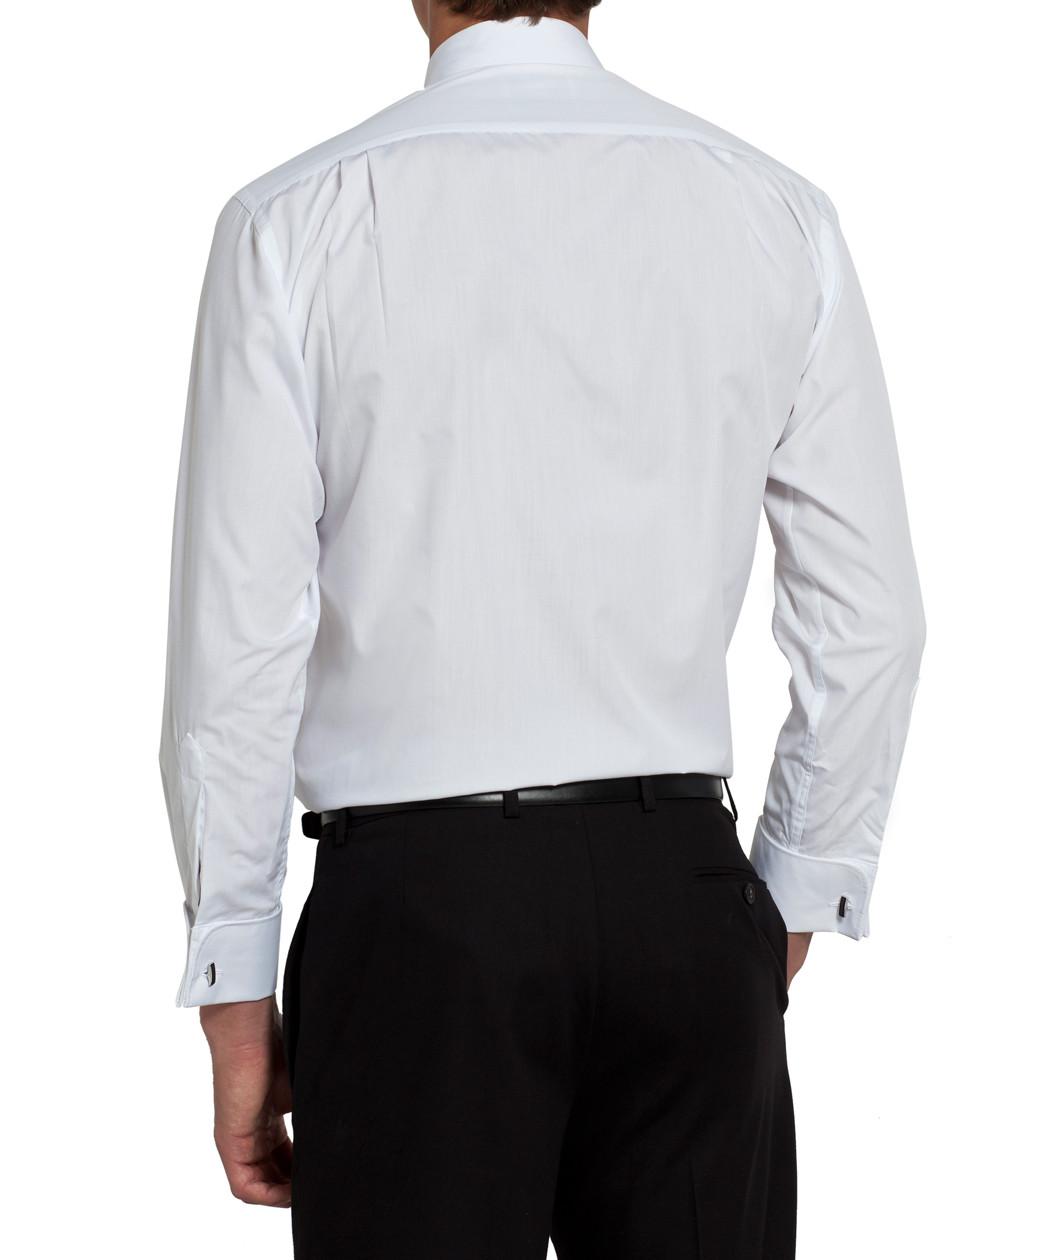 Van Heusen Classic White Tuxedo Shirt Mens Shirt Van Heusen